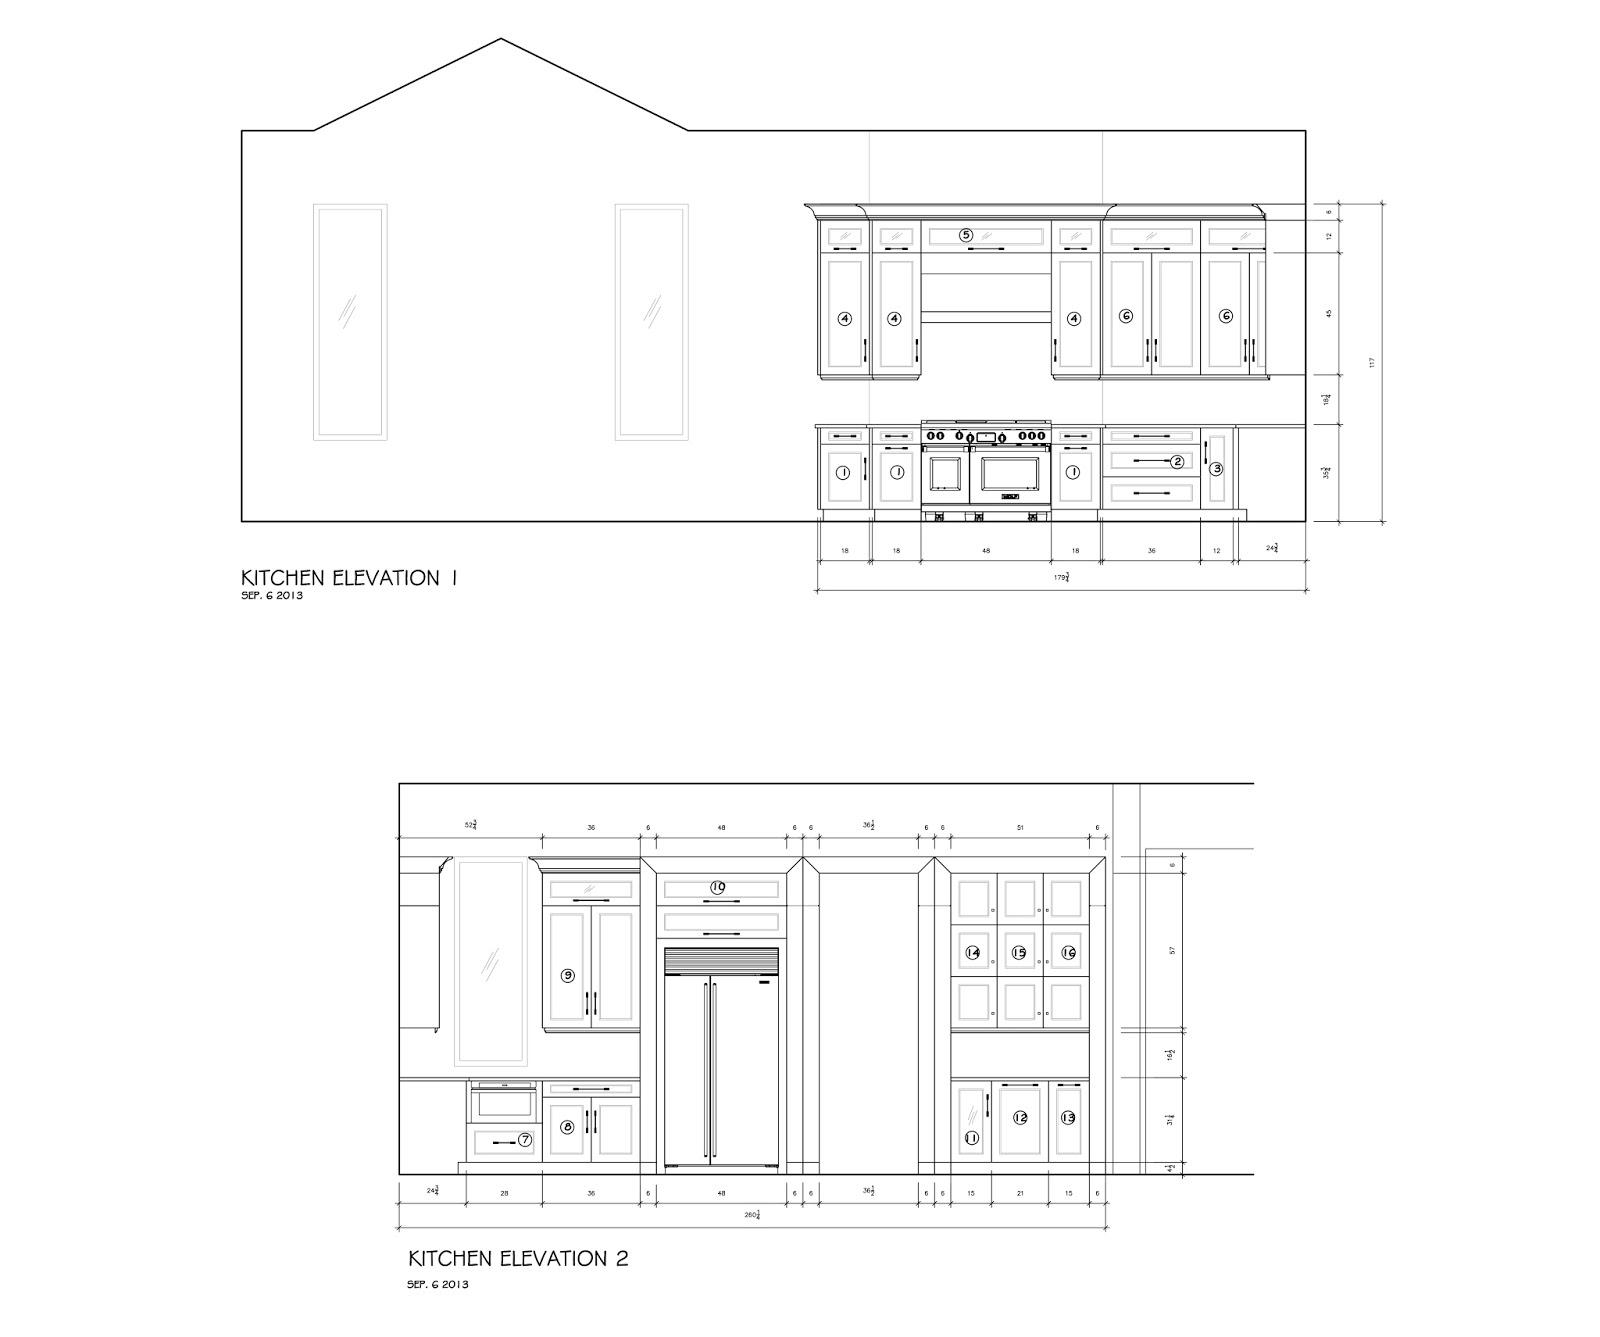 High End Kitchen Cabinets 1. Image Result For High End Kitchen Cabinets 1